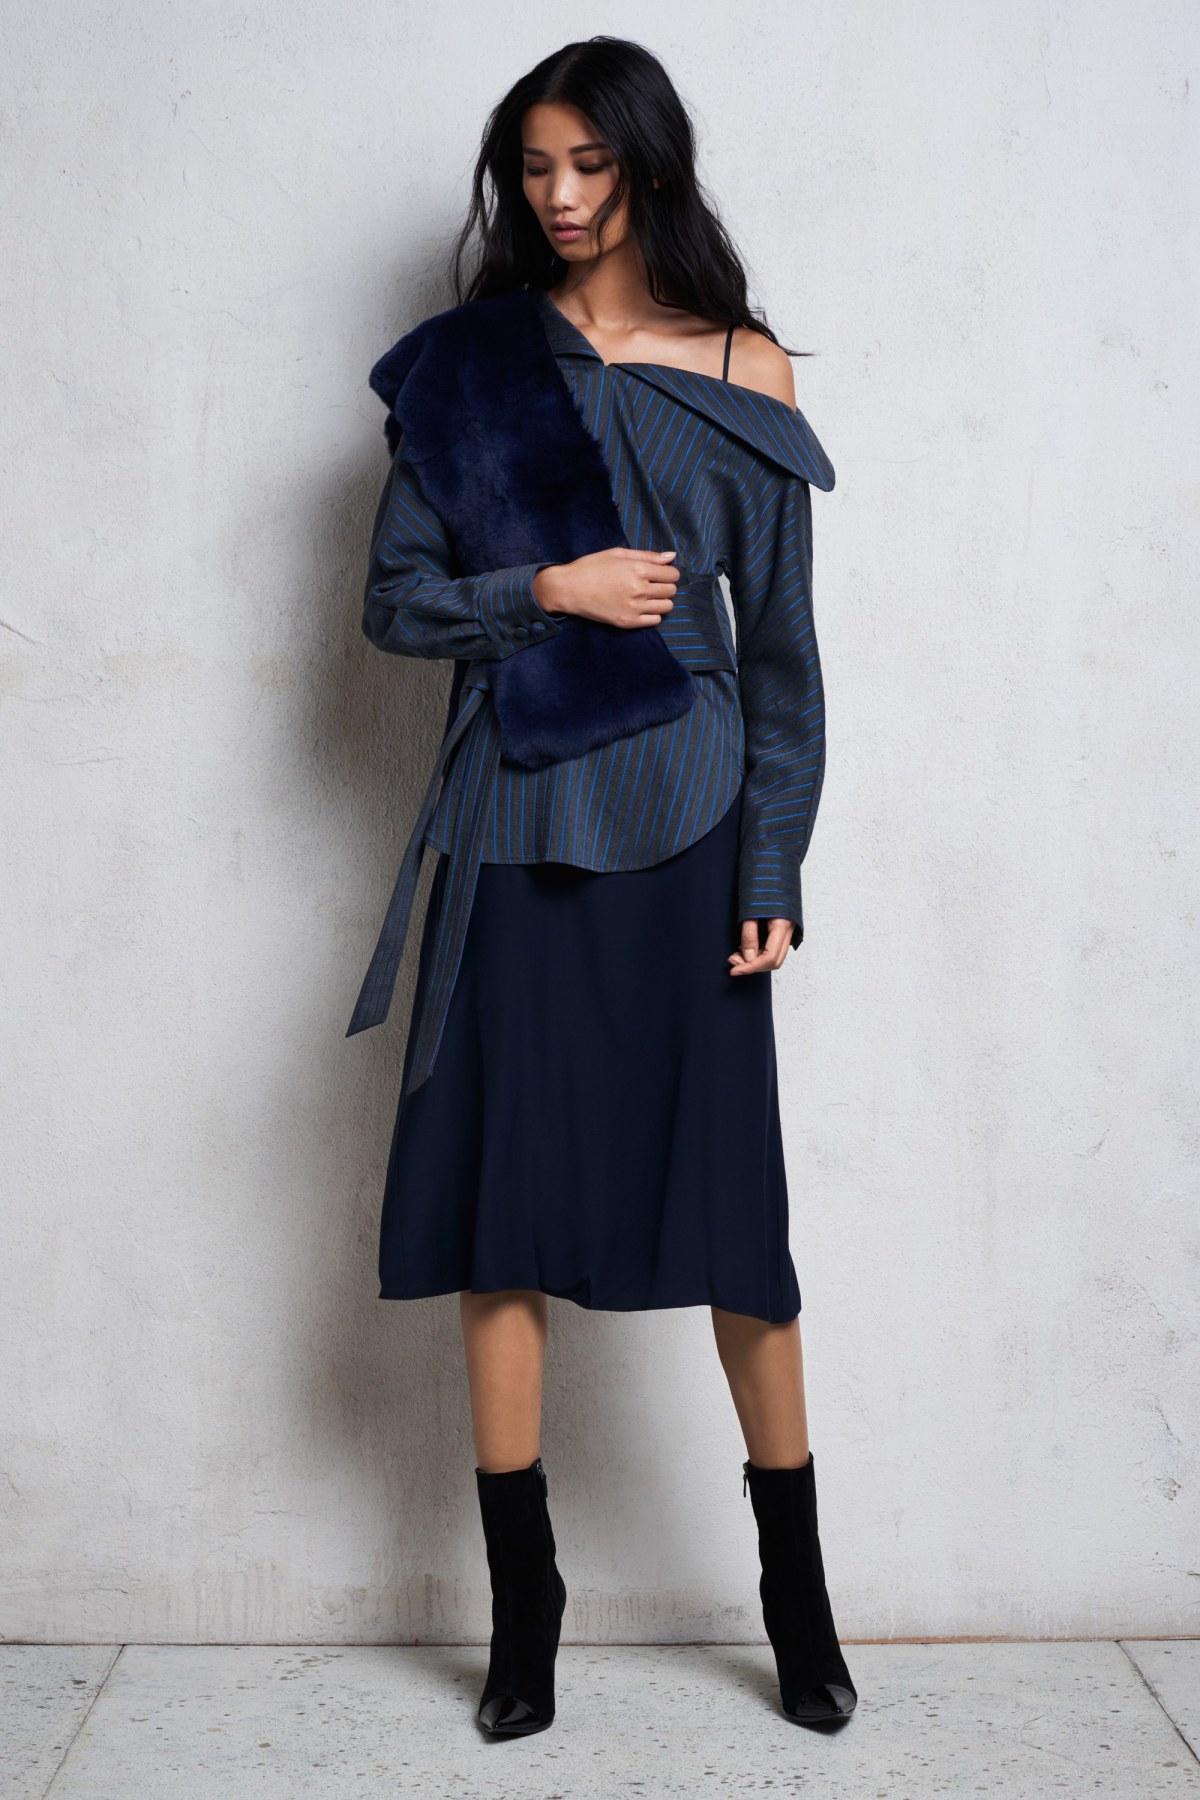 kimora-lee-simmons-pre-fall-2017-fashion-show-the-impression-03